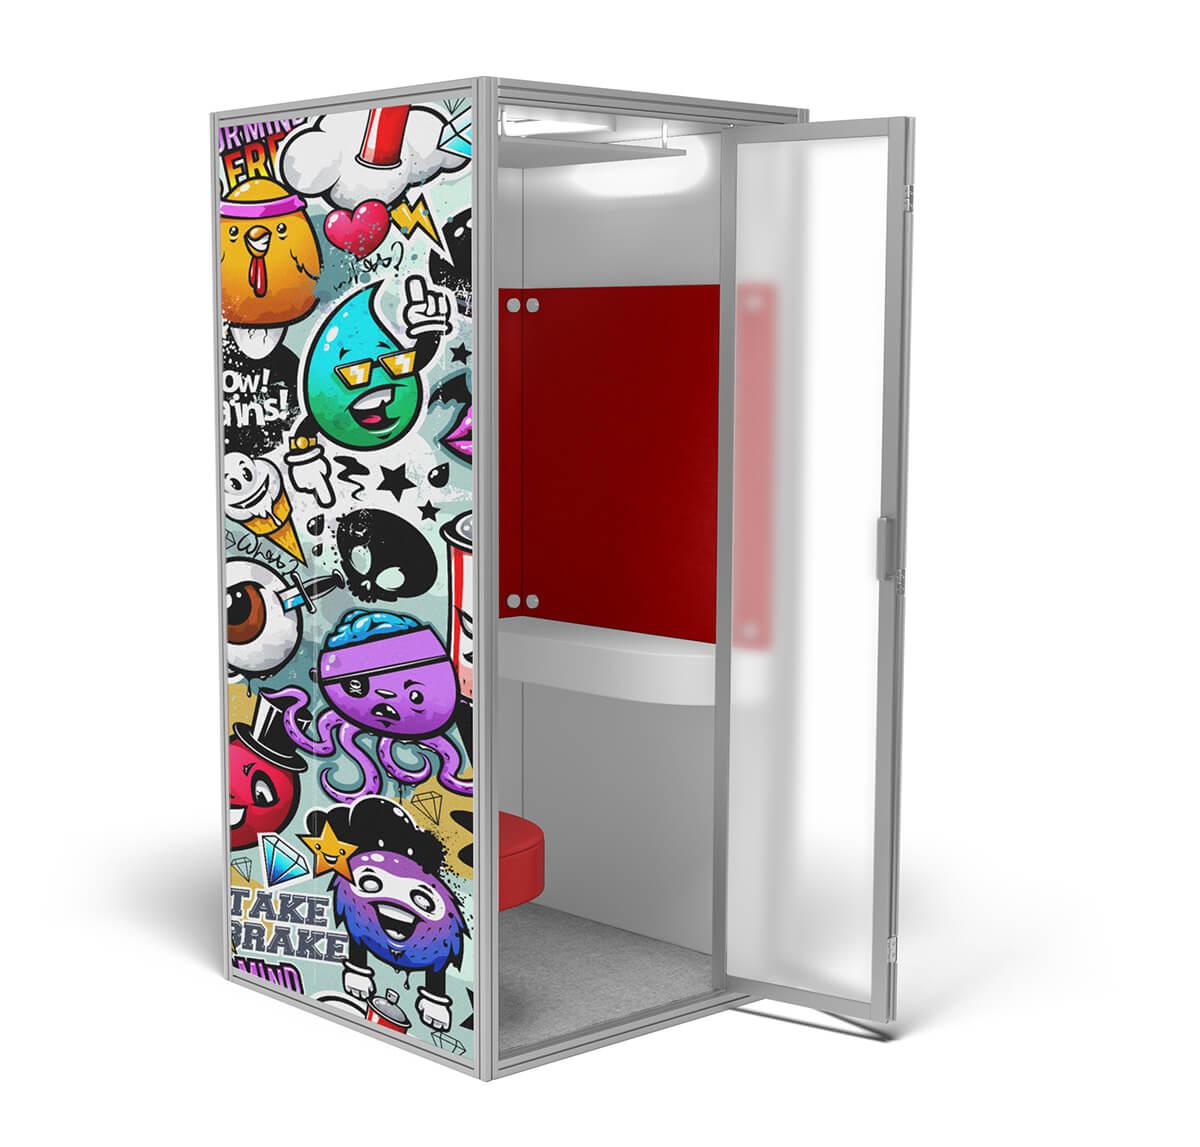 cubicall - modern phone booth - custom